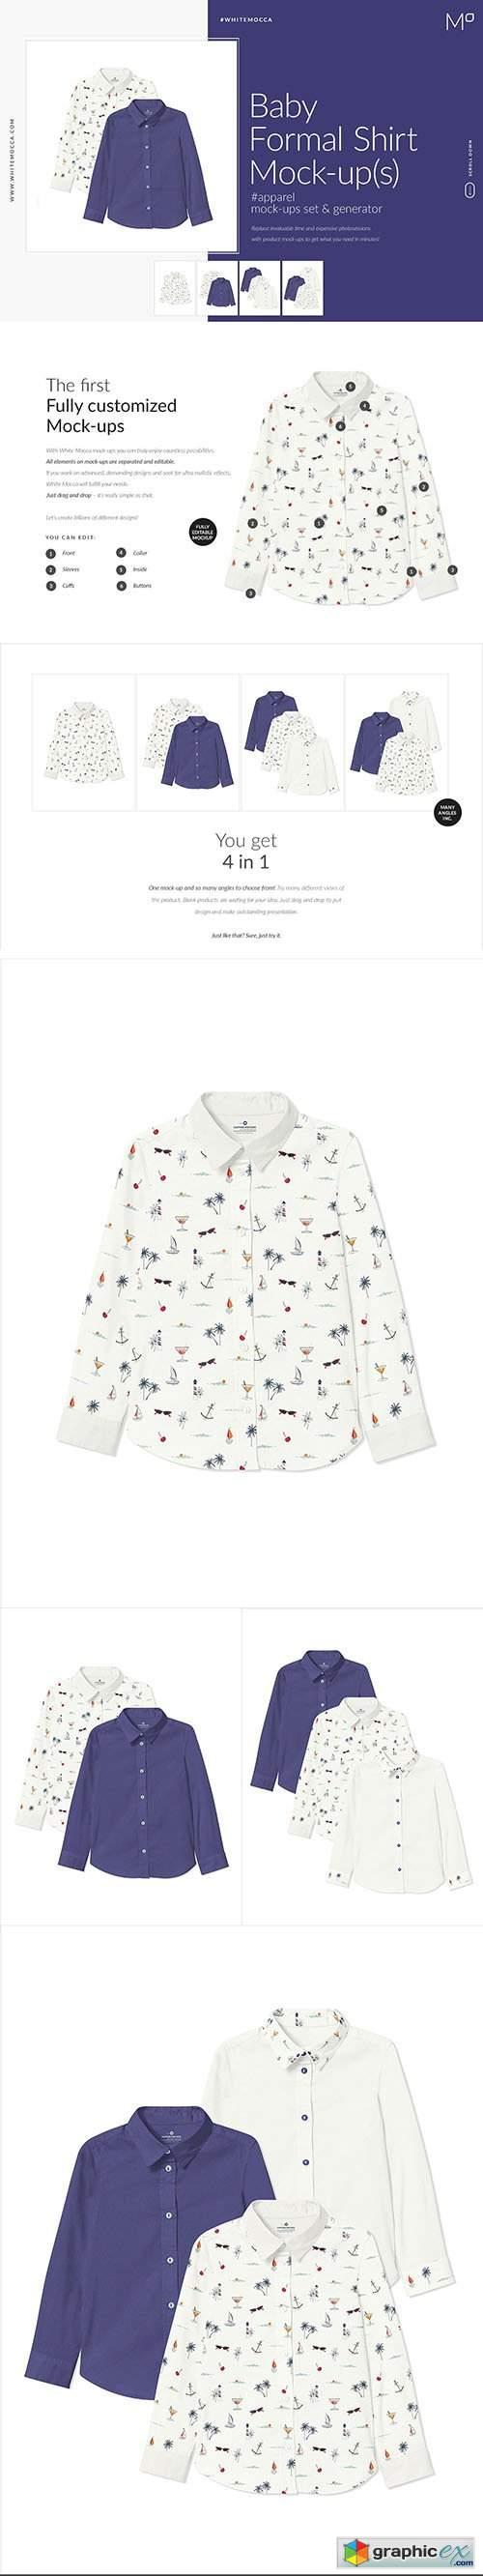 Baby Formal Shirt Mock-ups Set